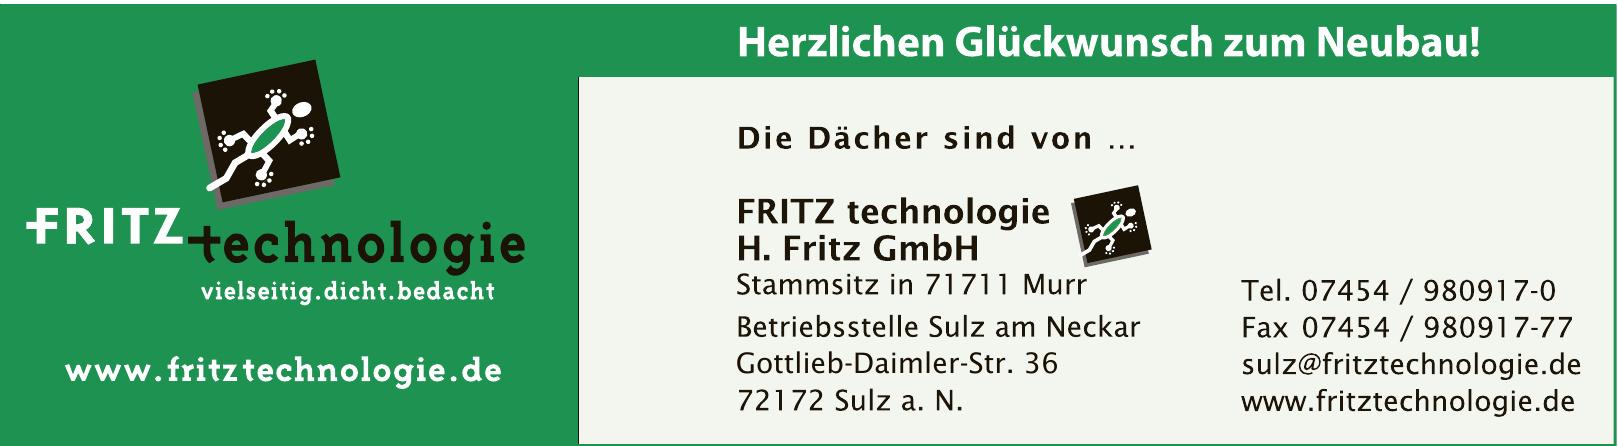 FRITZ technologie H. Fritz GmbH